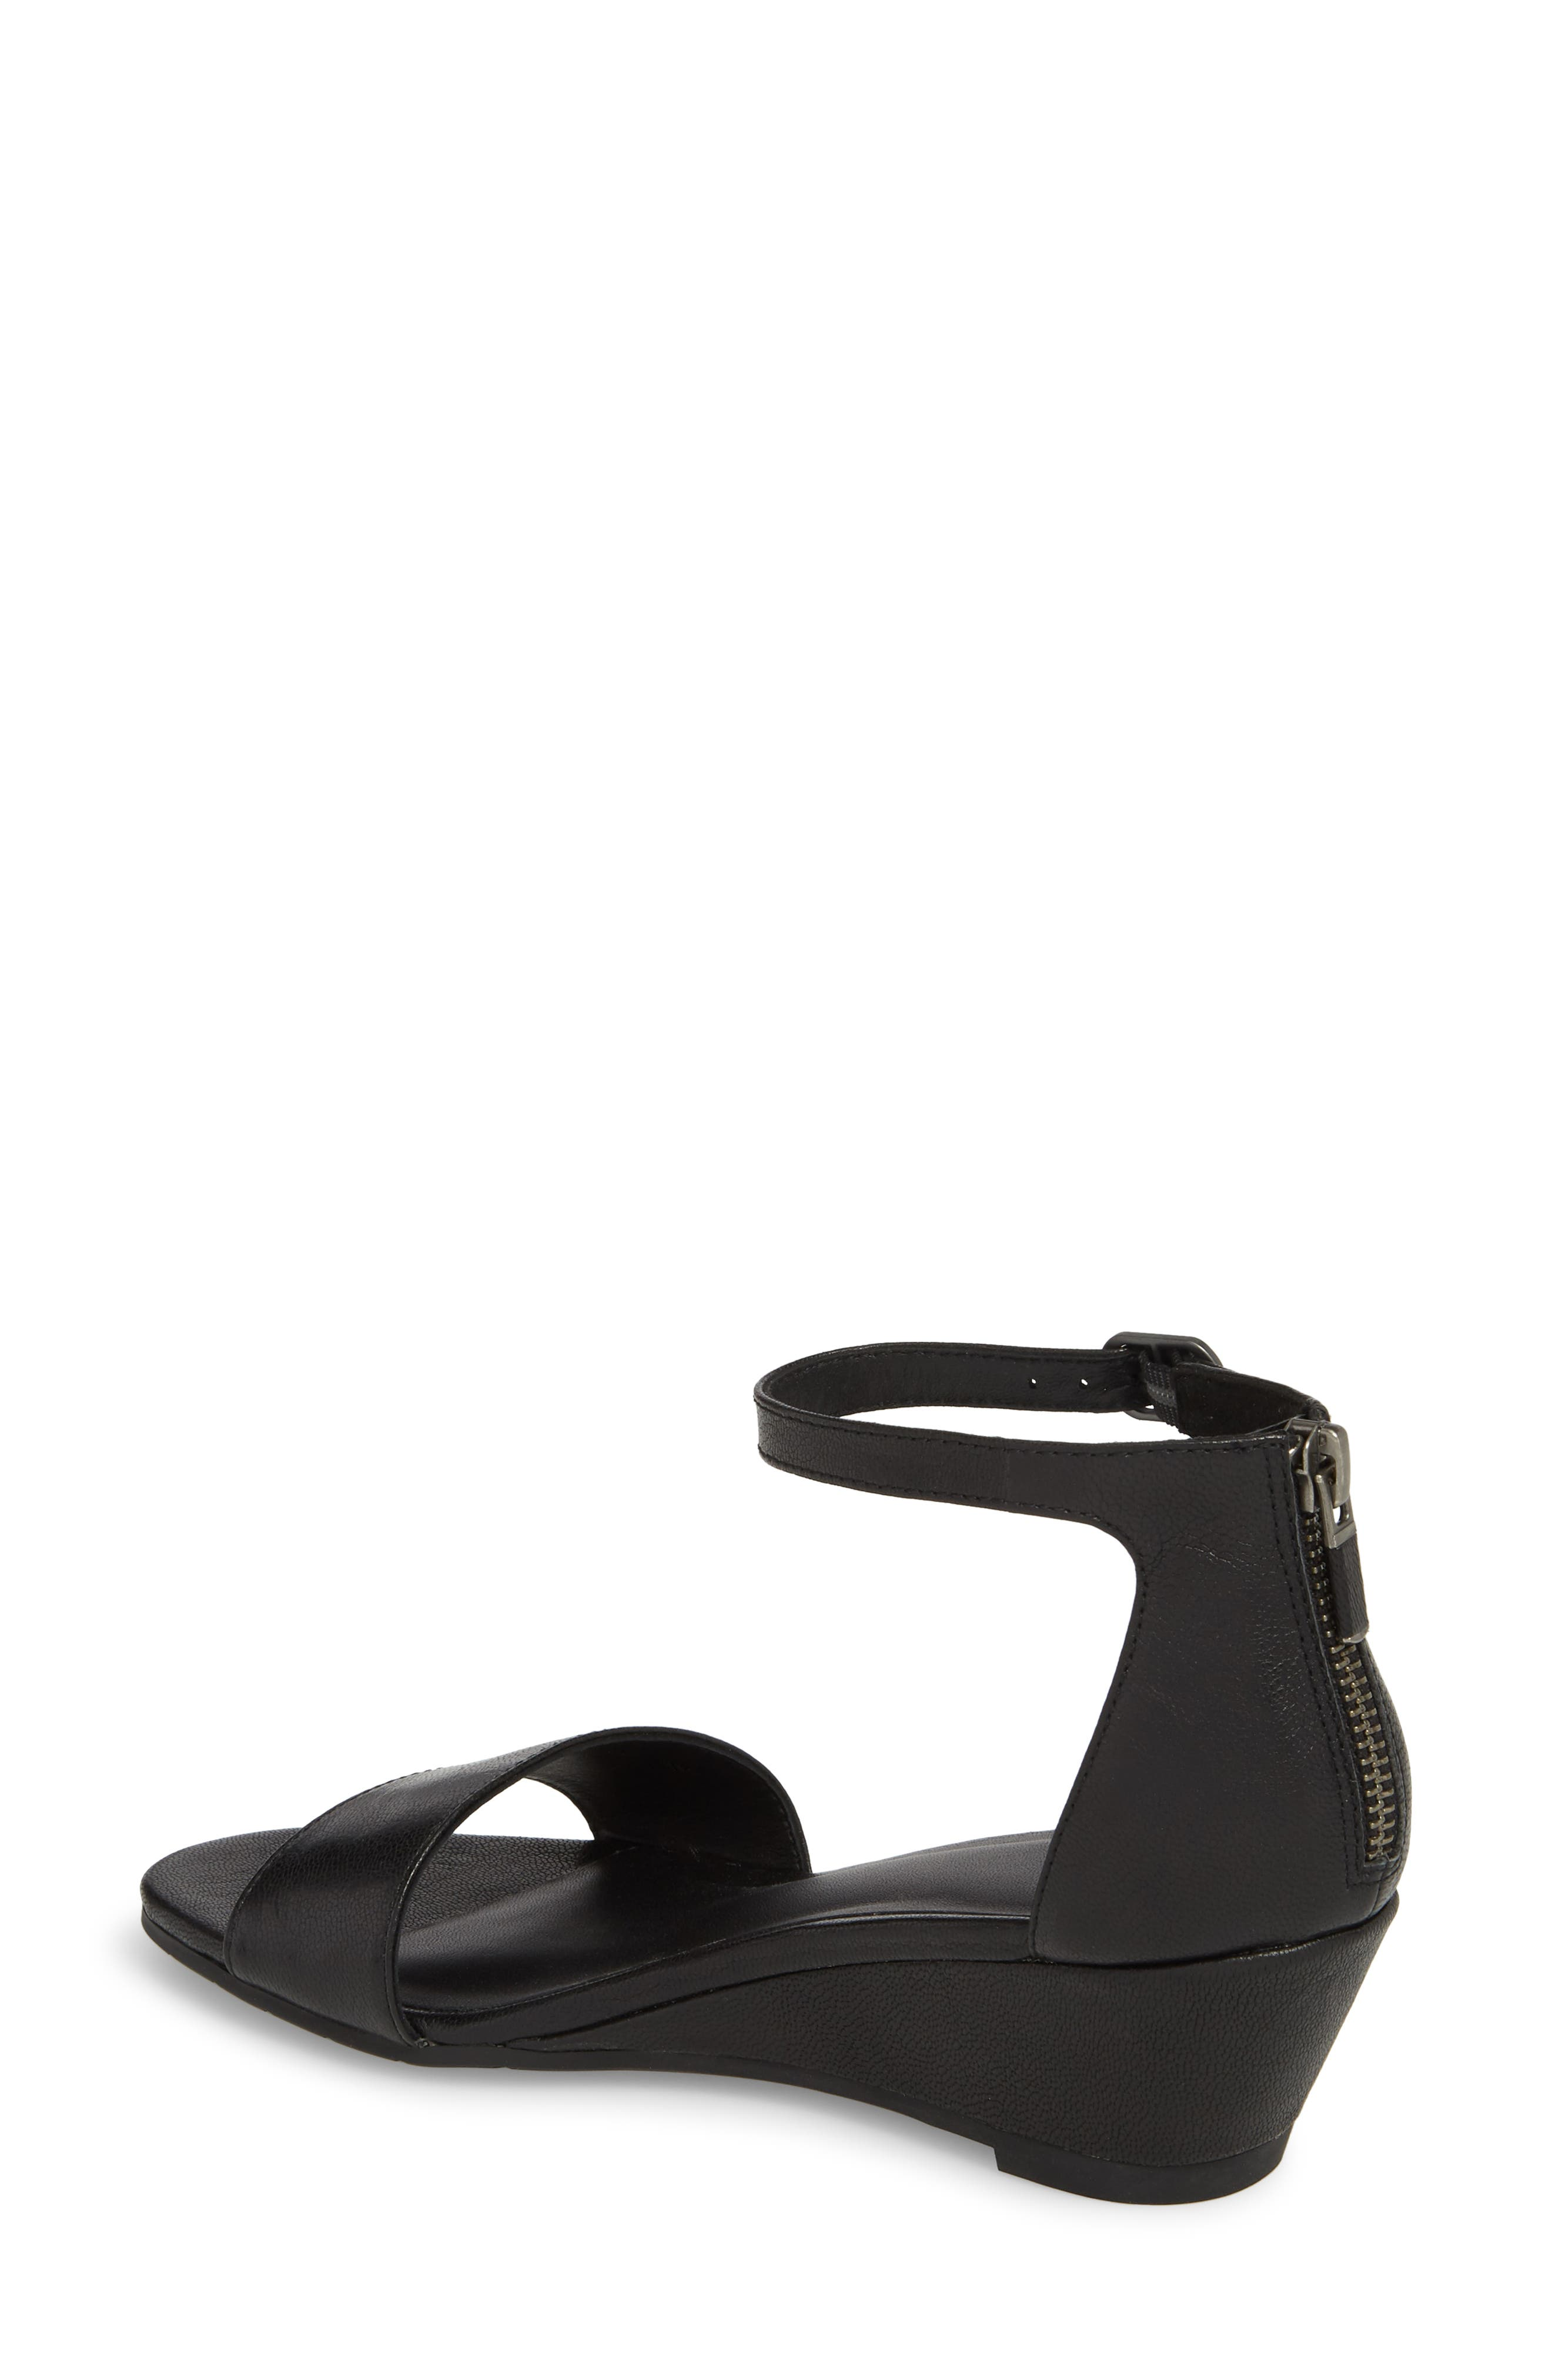 Mara Ankle Strap Wedge Sandal,                             Alternate thumbnail 2, color,                             Black Leather